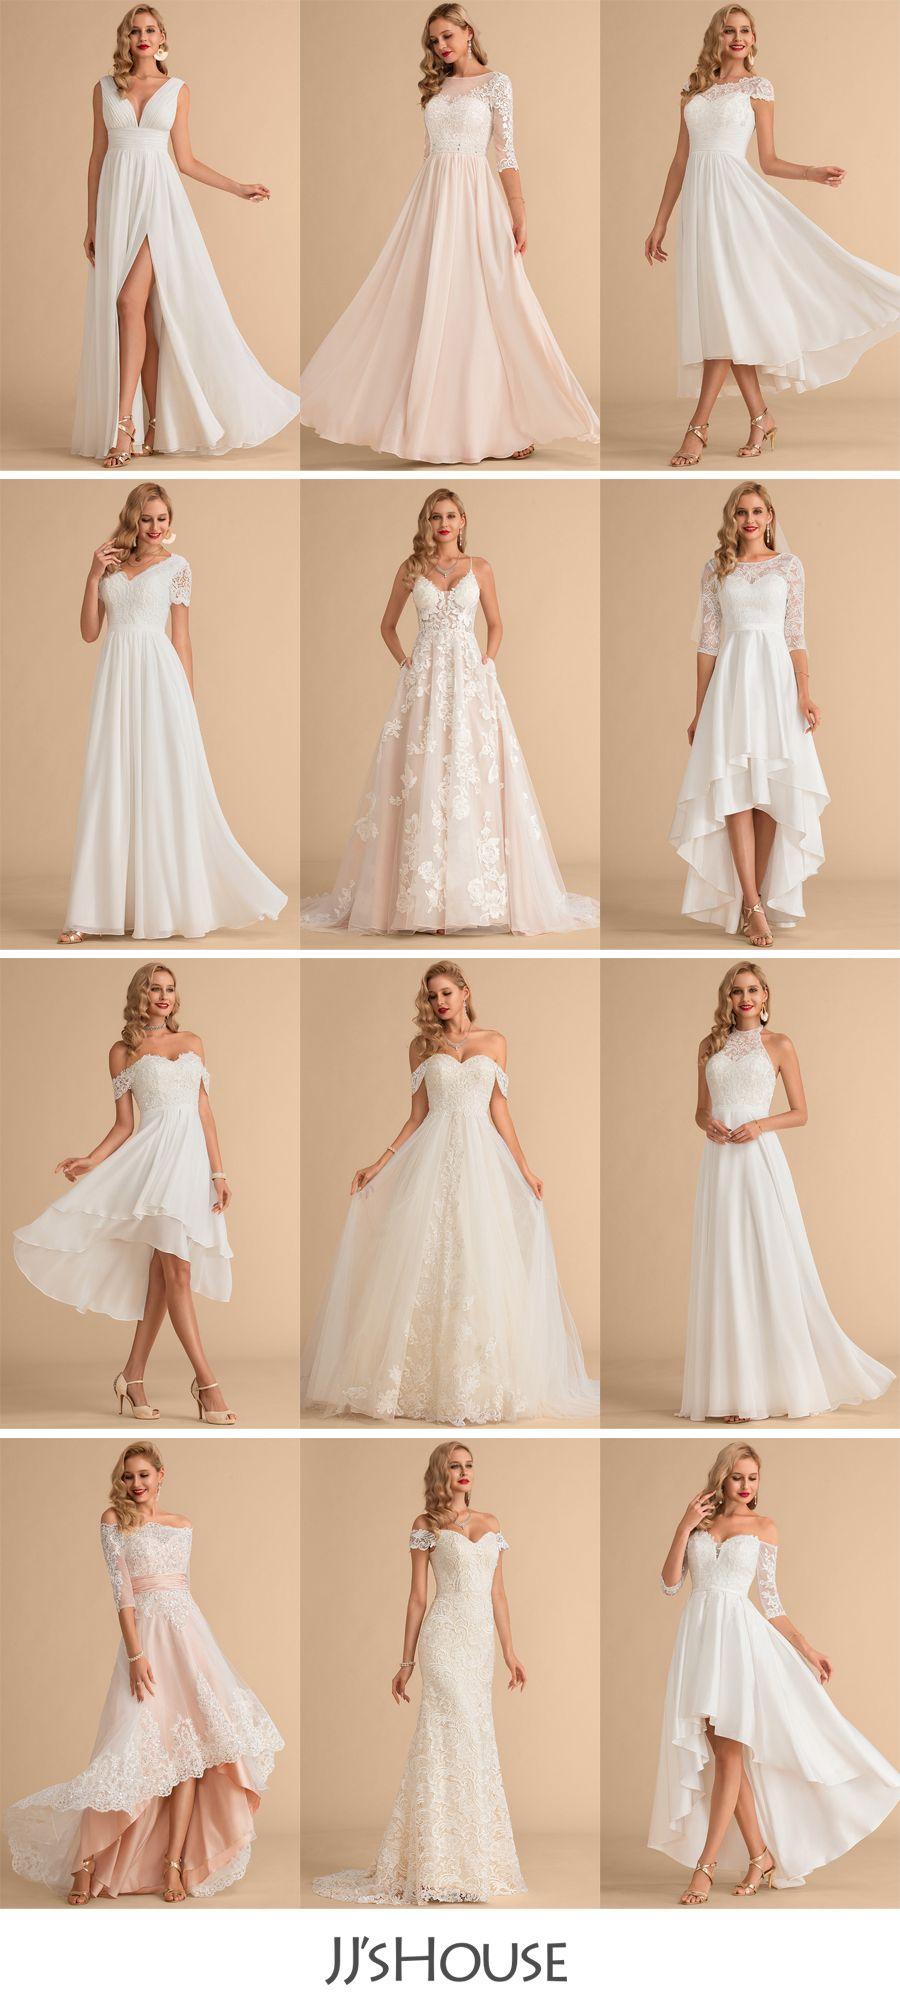 Jj Shouse Wedding Dresses In 2020 Modest Lace Wedding Dresses Boho Wedding Gowns Wedding Dresses